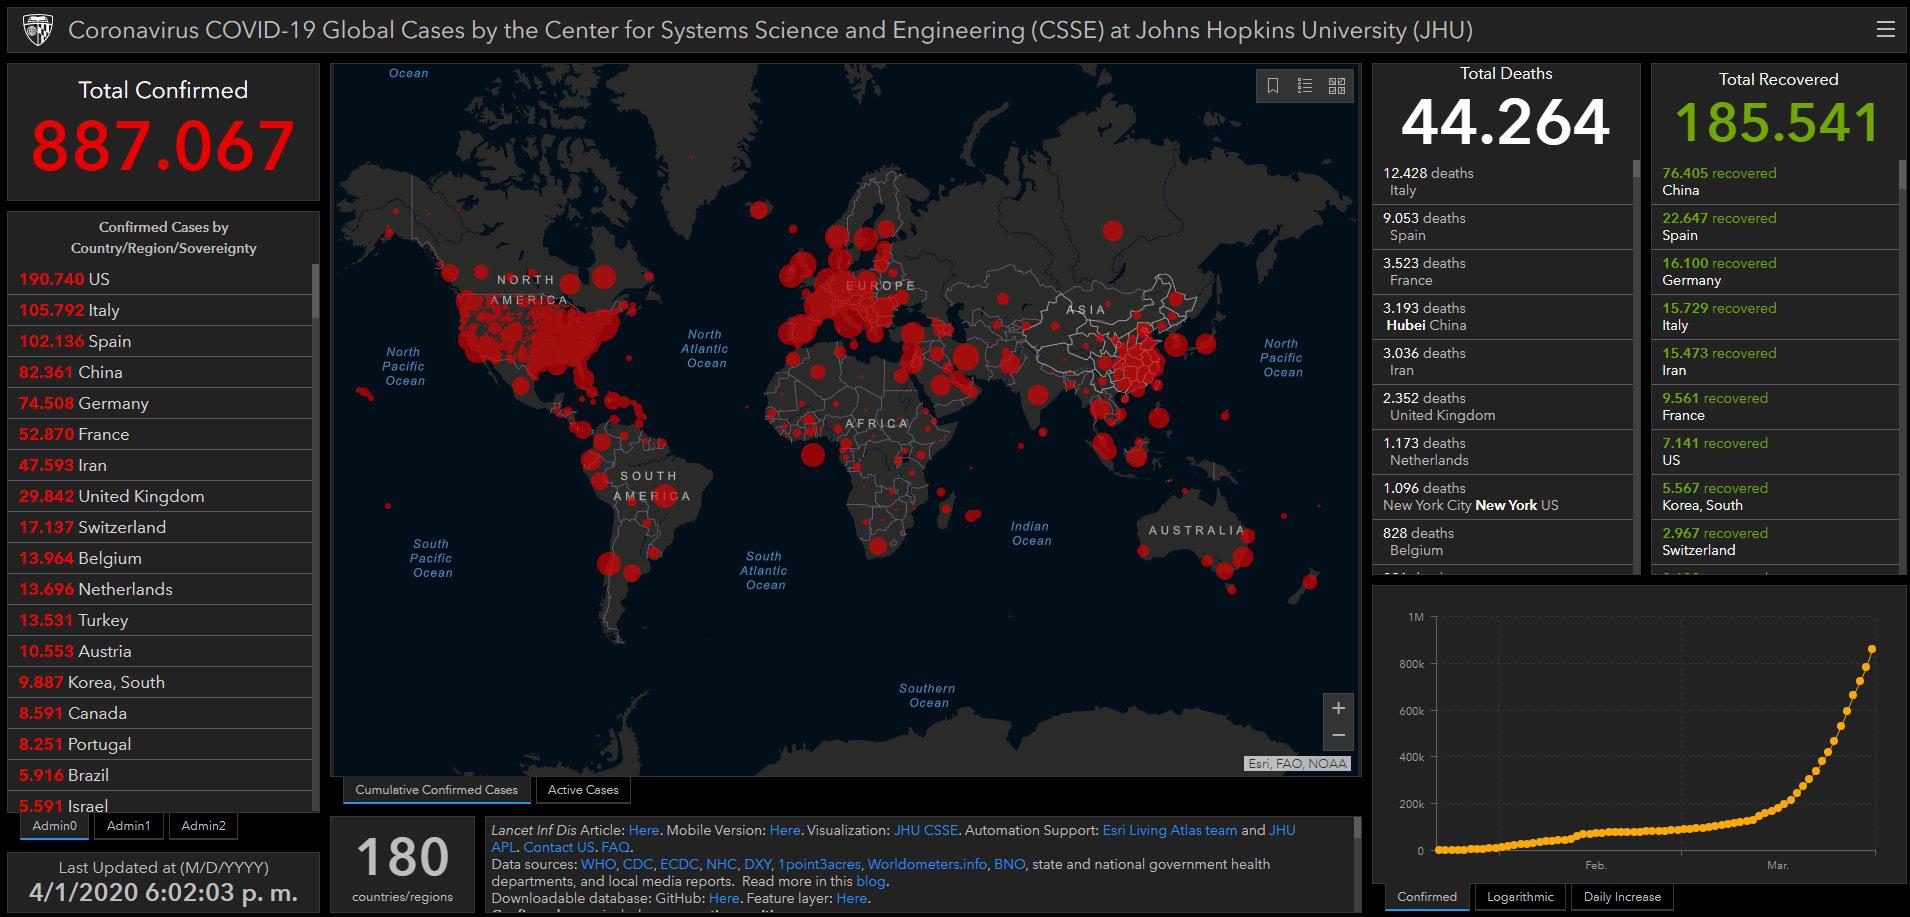 coronavirus covid estadisticas globales mapa 1 abril 2020